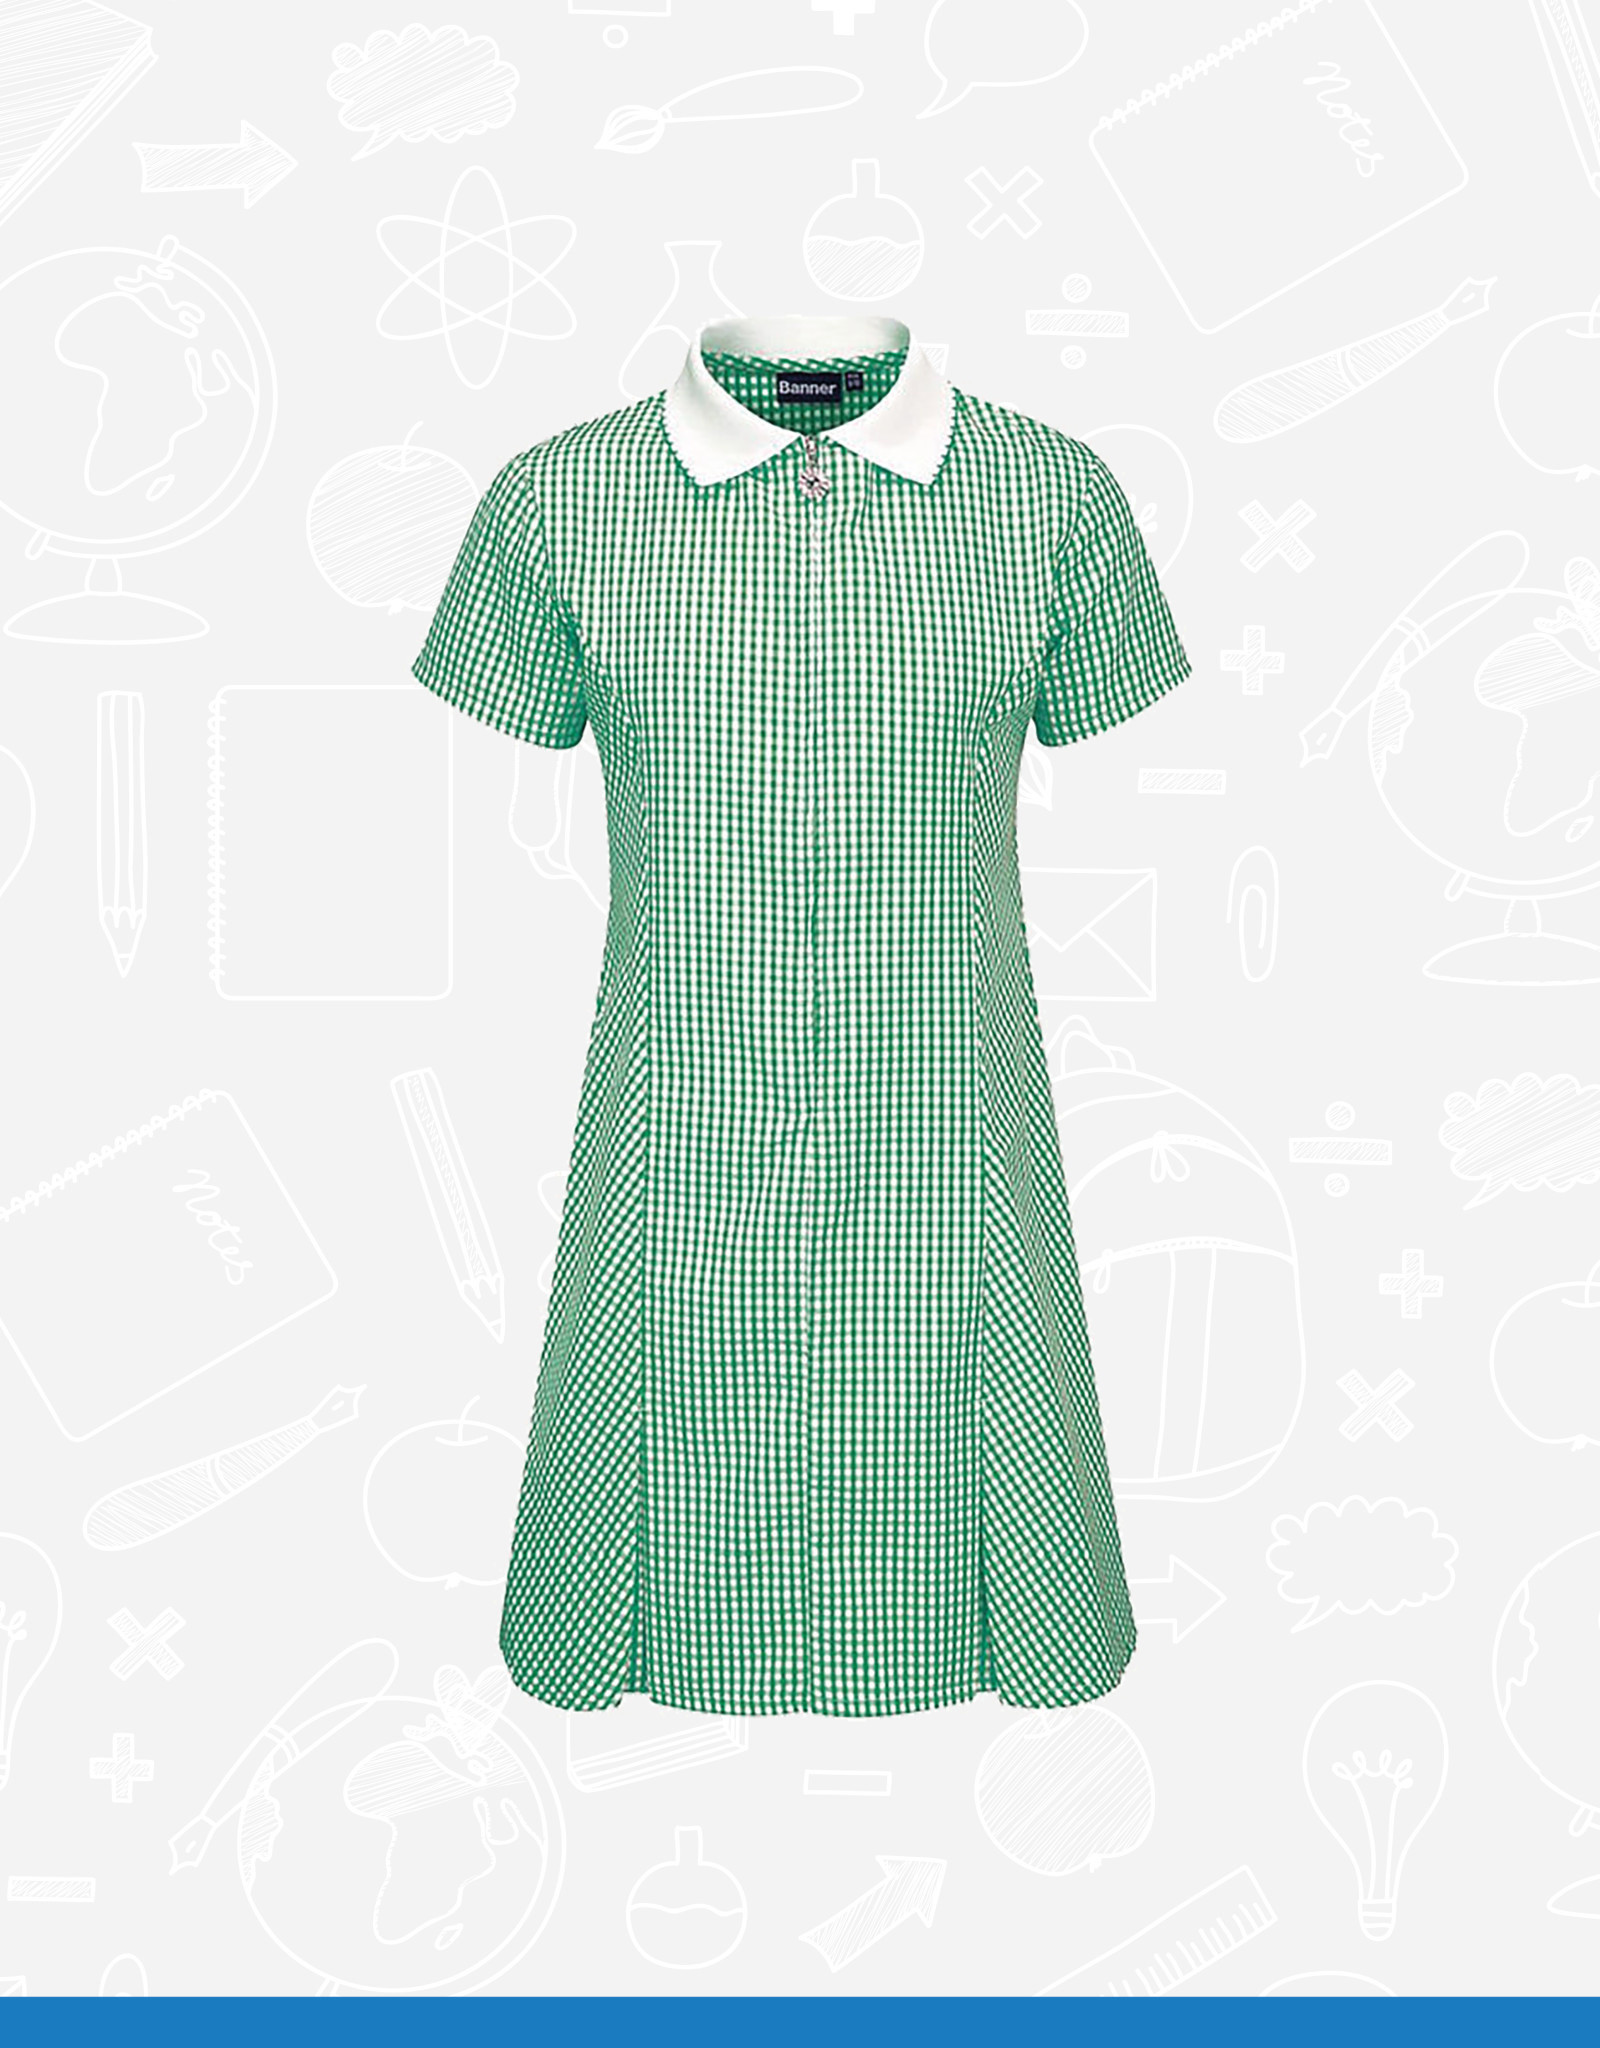 Banner Avon Zip Gingham Dress (913104) (BAN)